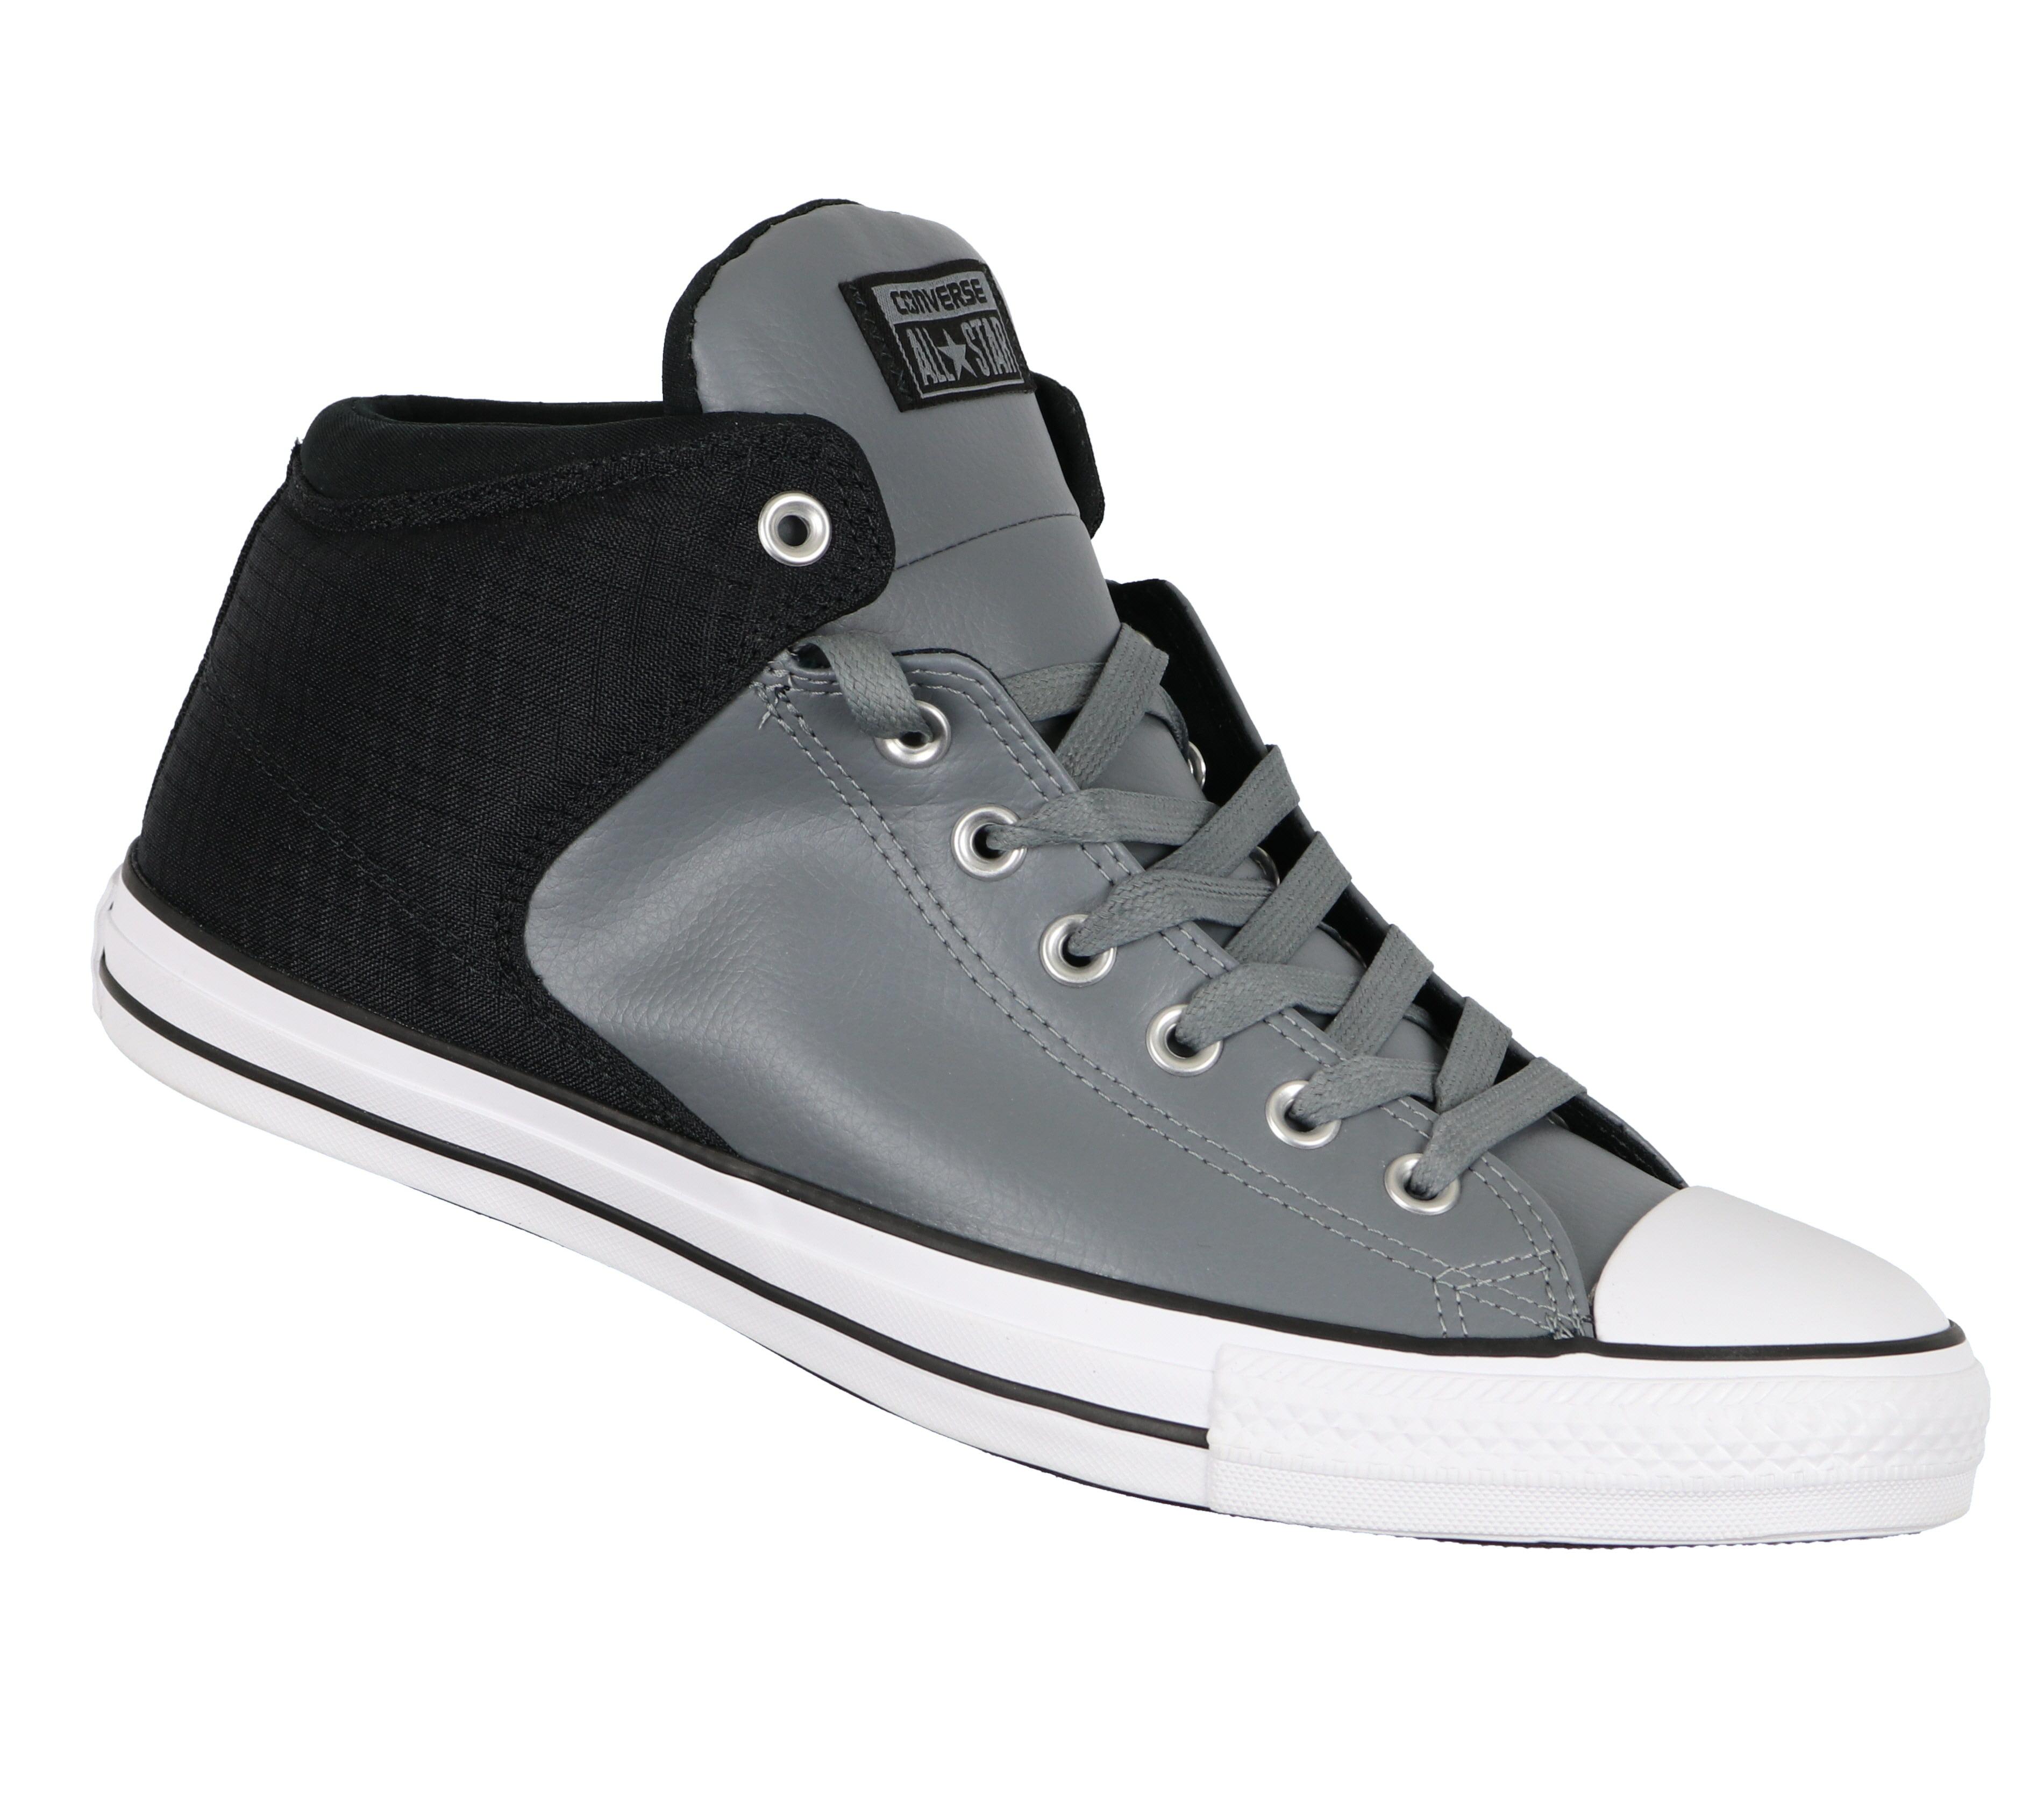 Converse Men's Chuck Taylor All Star High Street Hi Tops sz 12 Gray Black 159453C